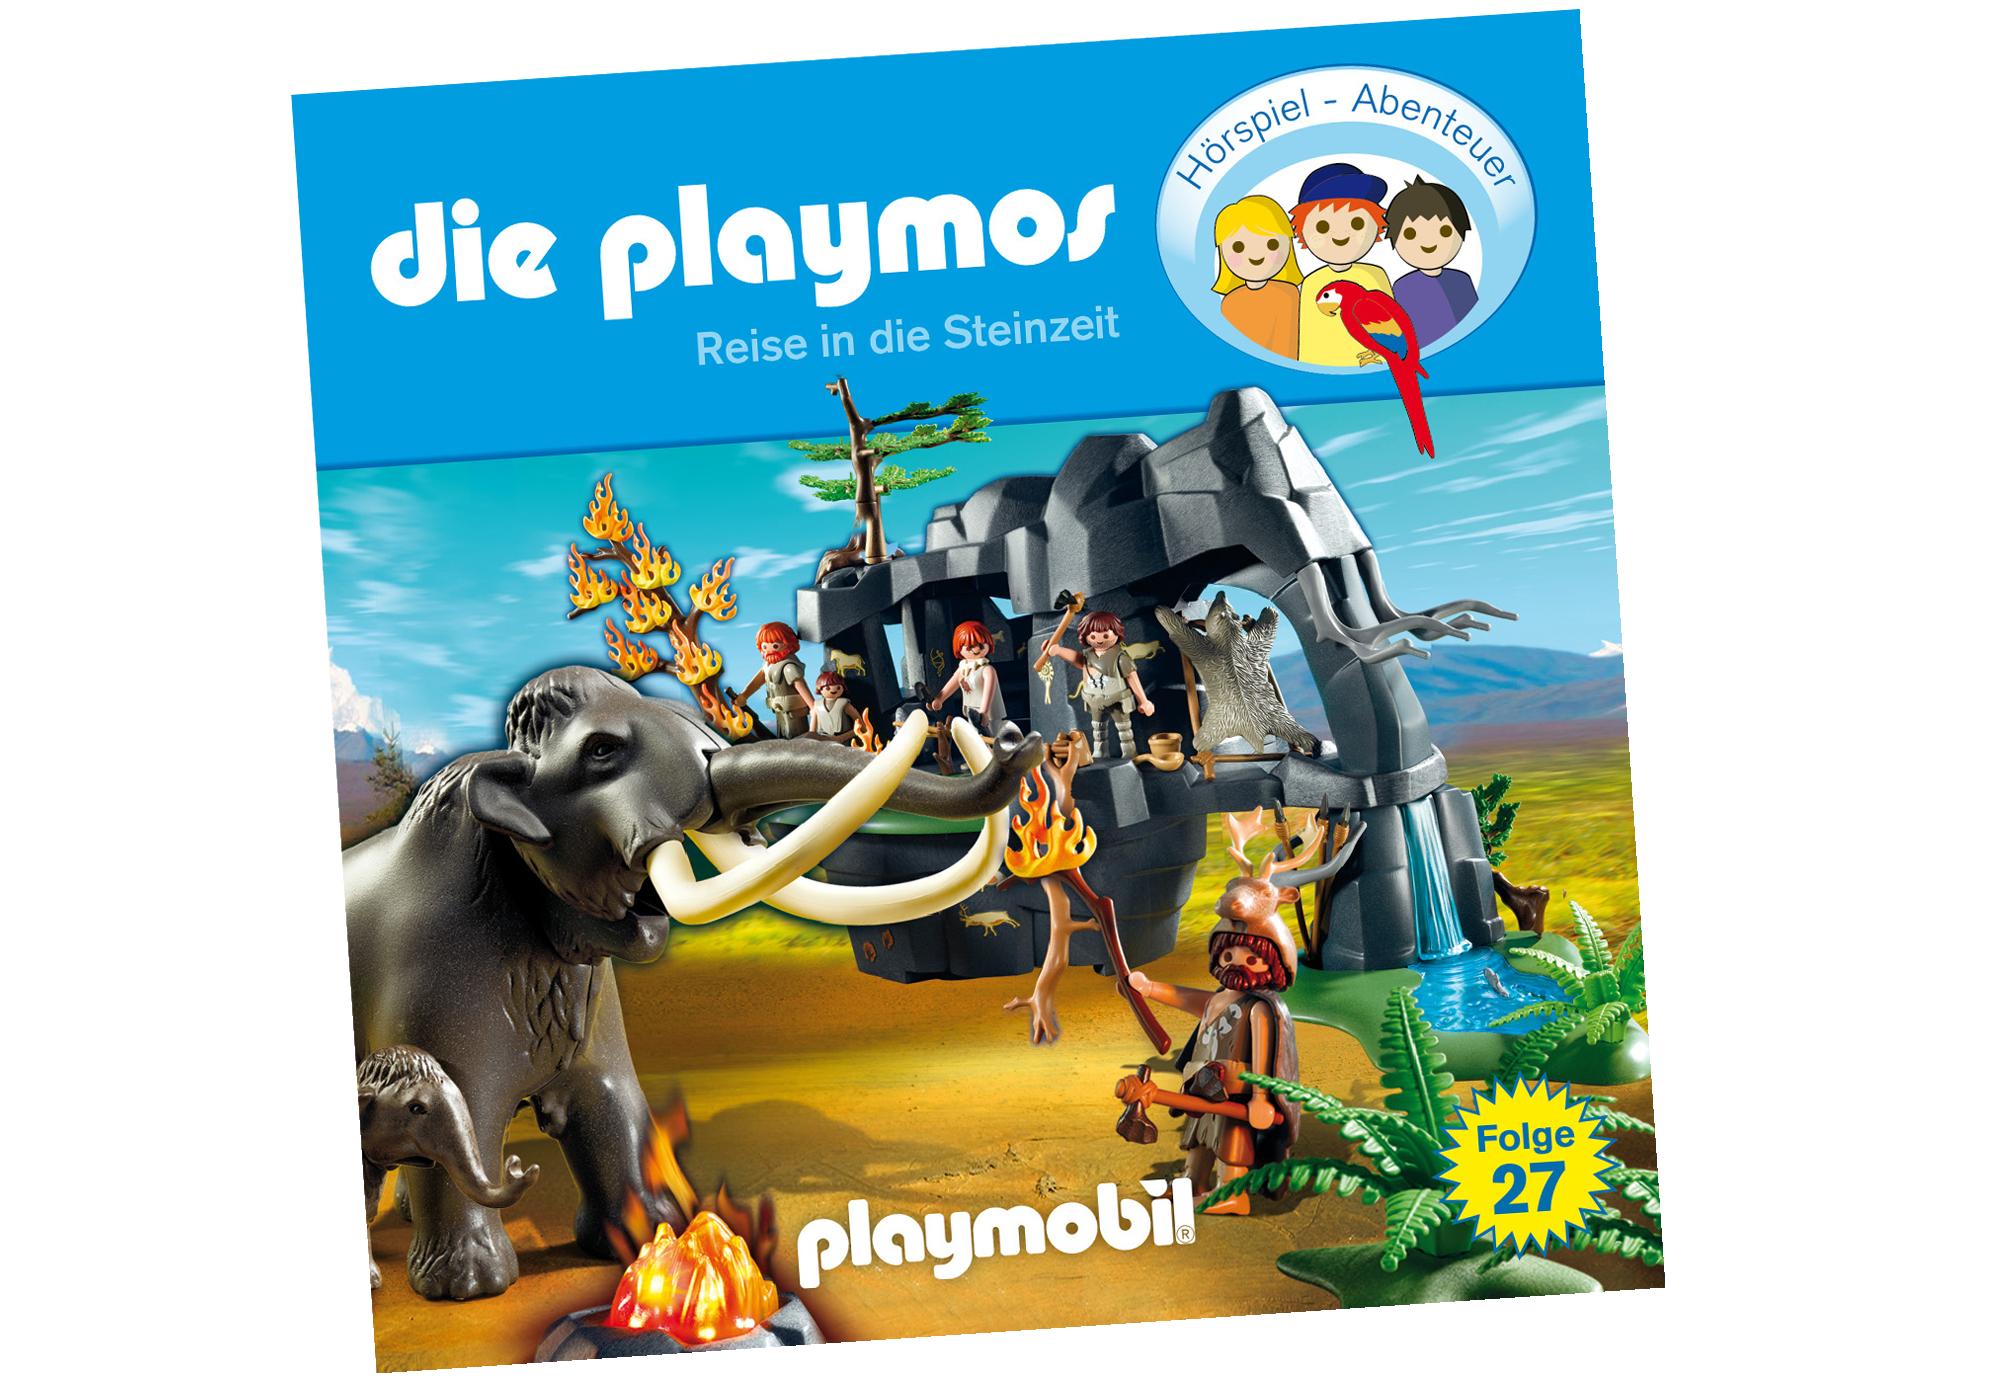 http://media.playmobil.com/i/playmobil/80343_product_detail/Reise in die Steinzeit (27) - CD